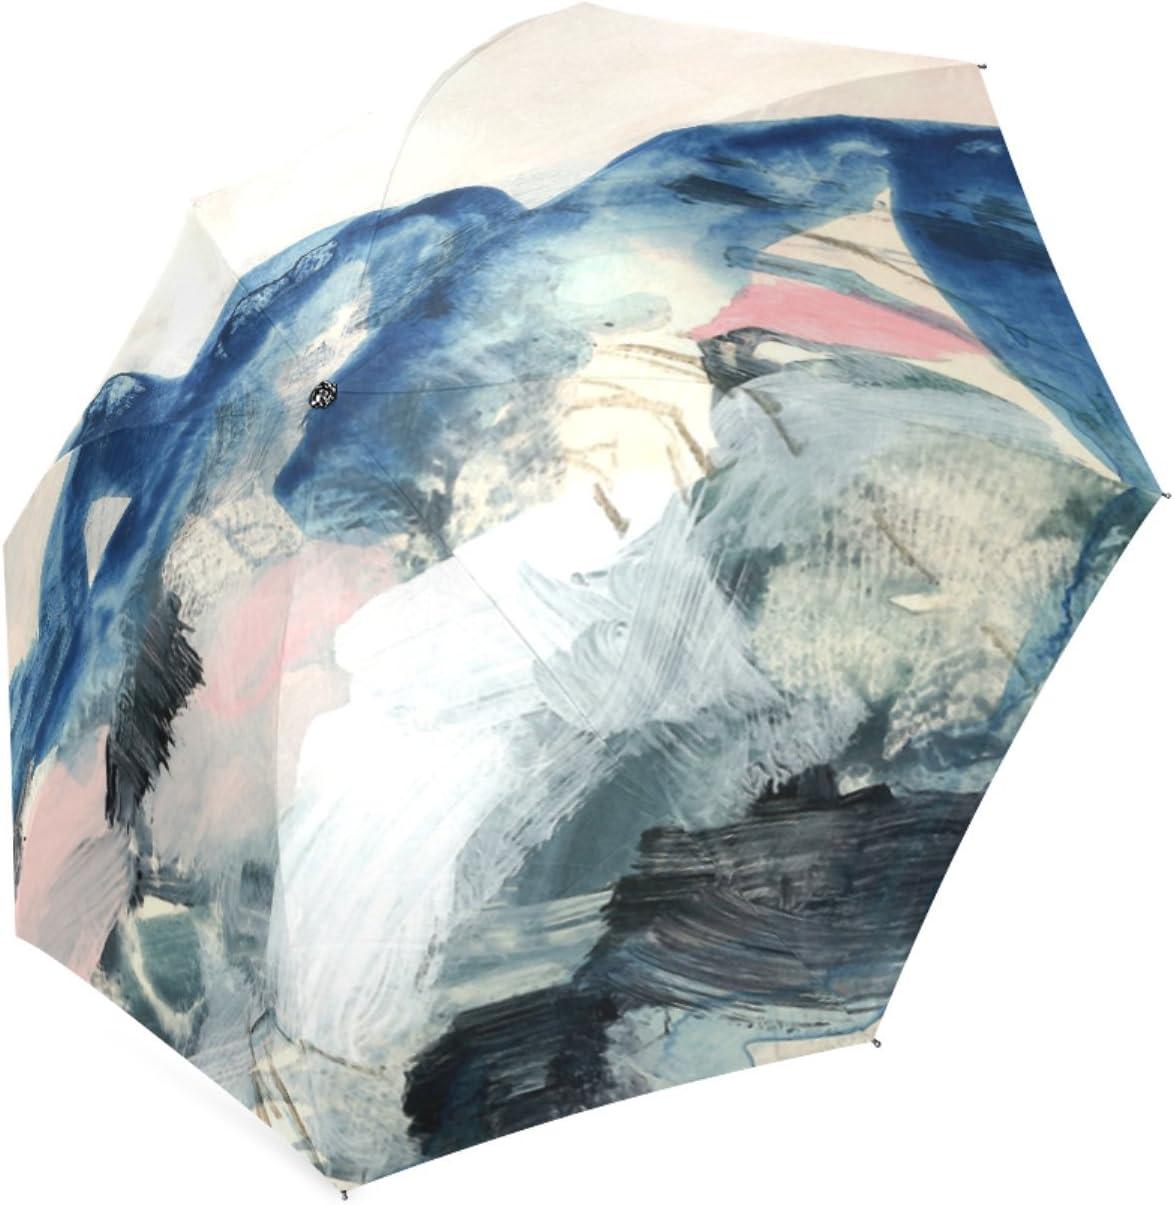 Beautytool Customized Abstract Painting Folding Travel Umbrella